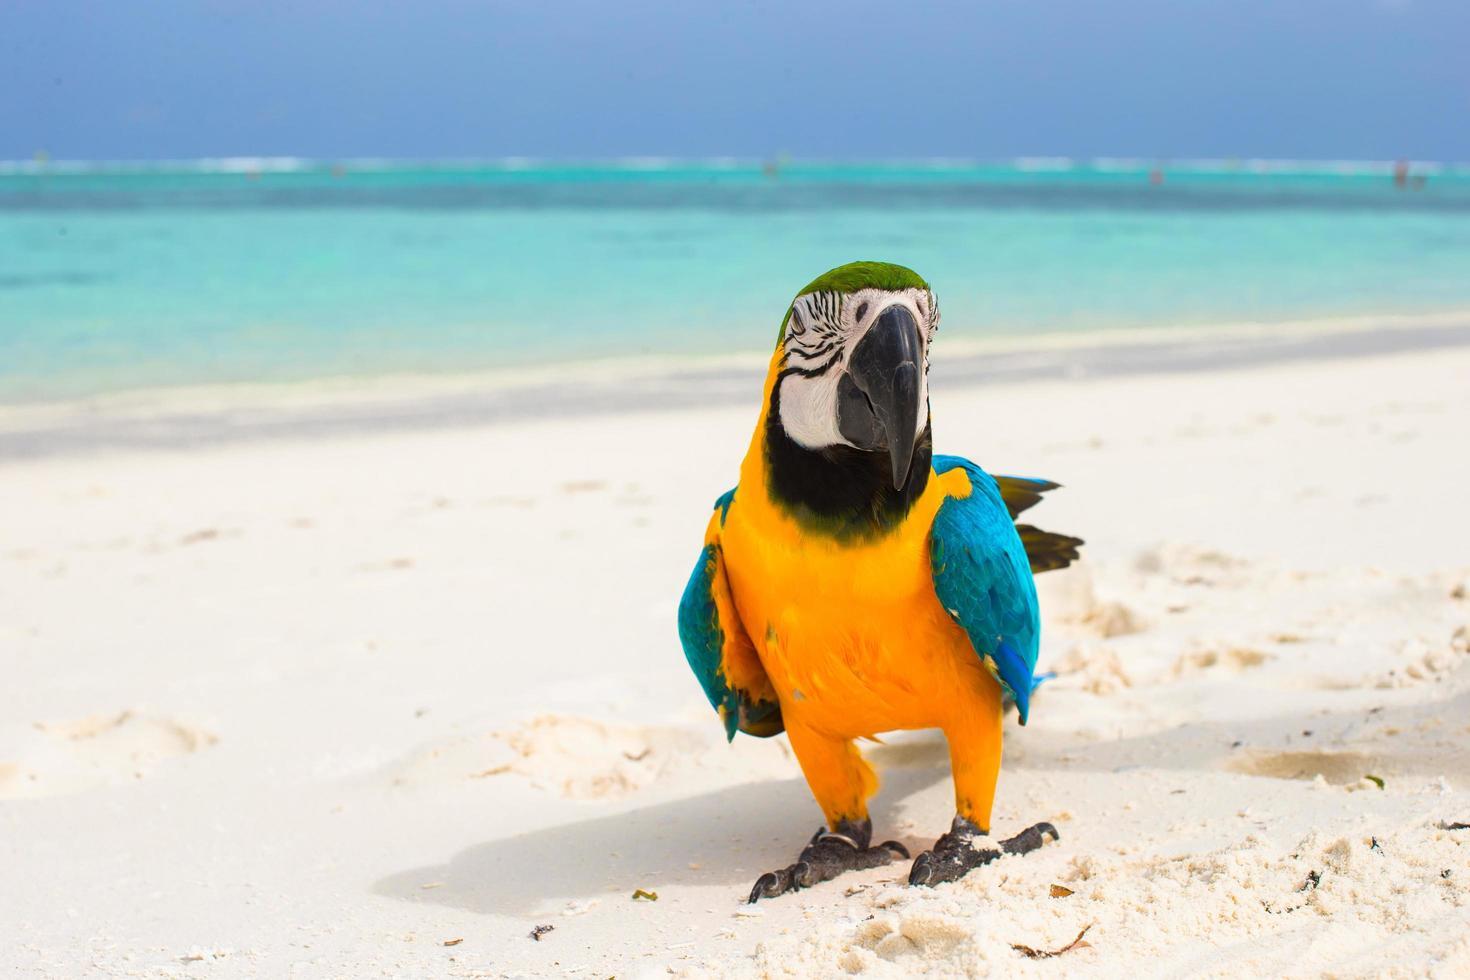 kleurrijke papegaai op wit zand foto